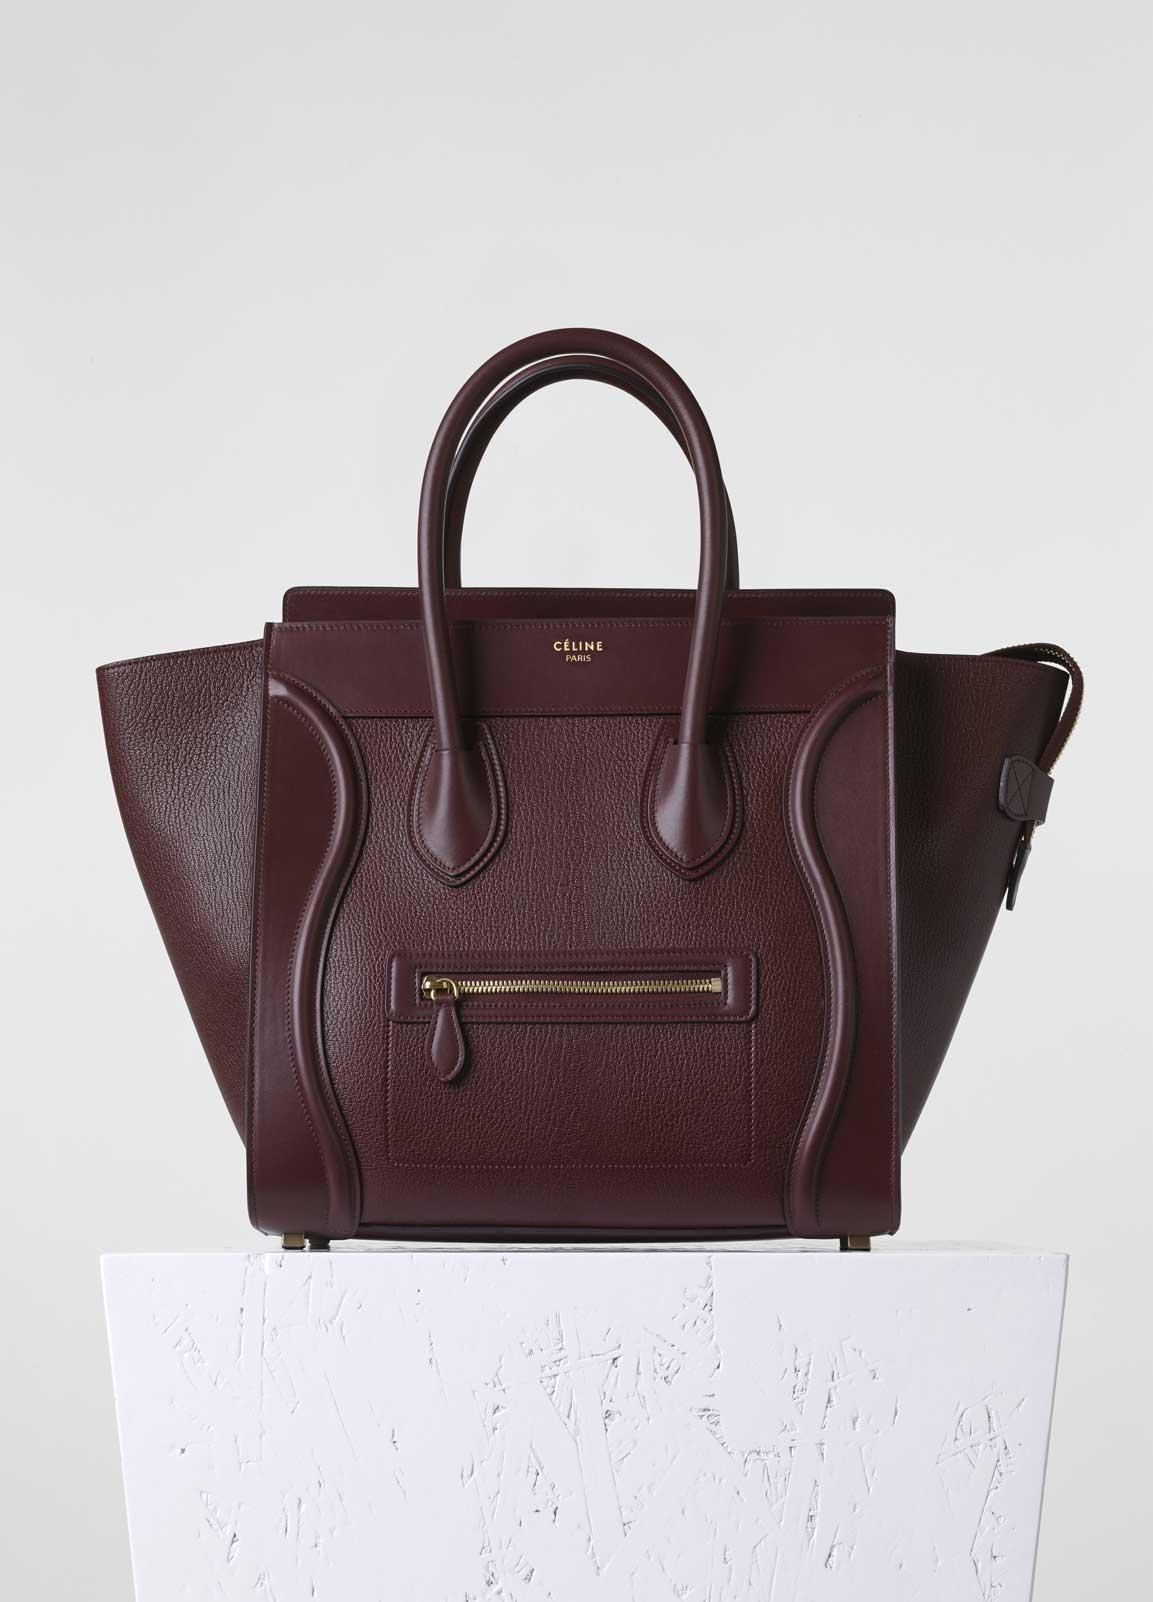 ba82a6f98a celine fall winter 2015 bags handbags purses season collection